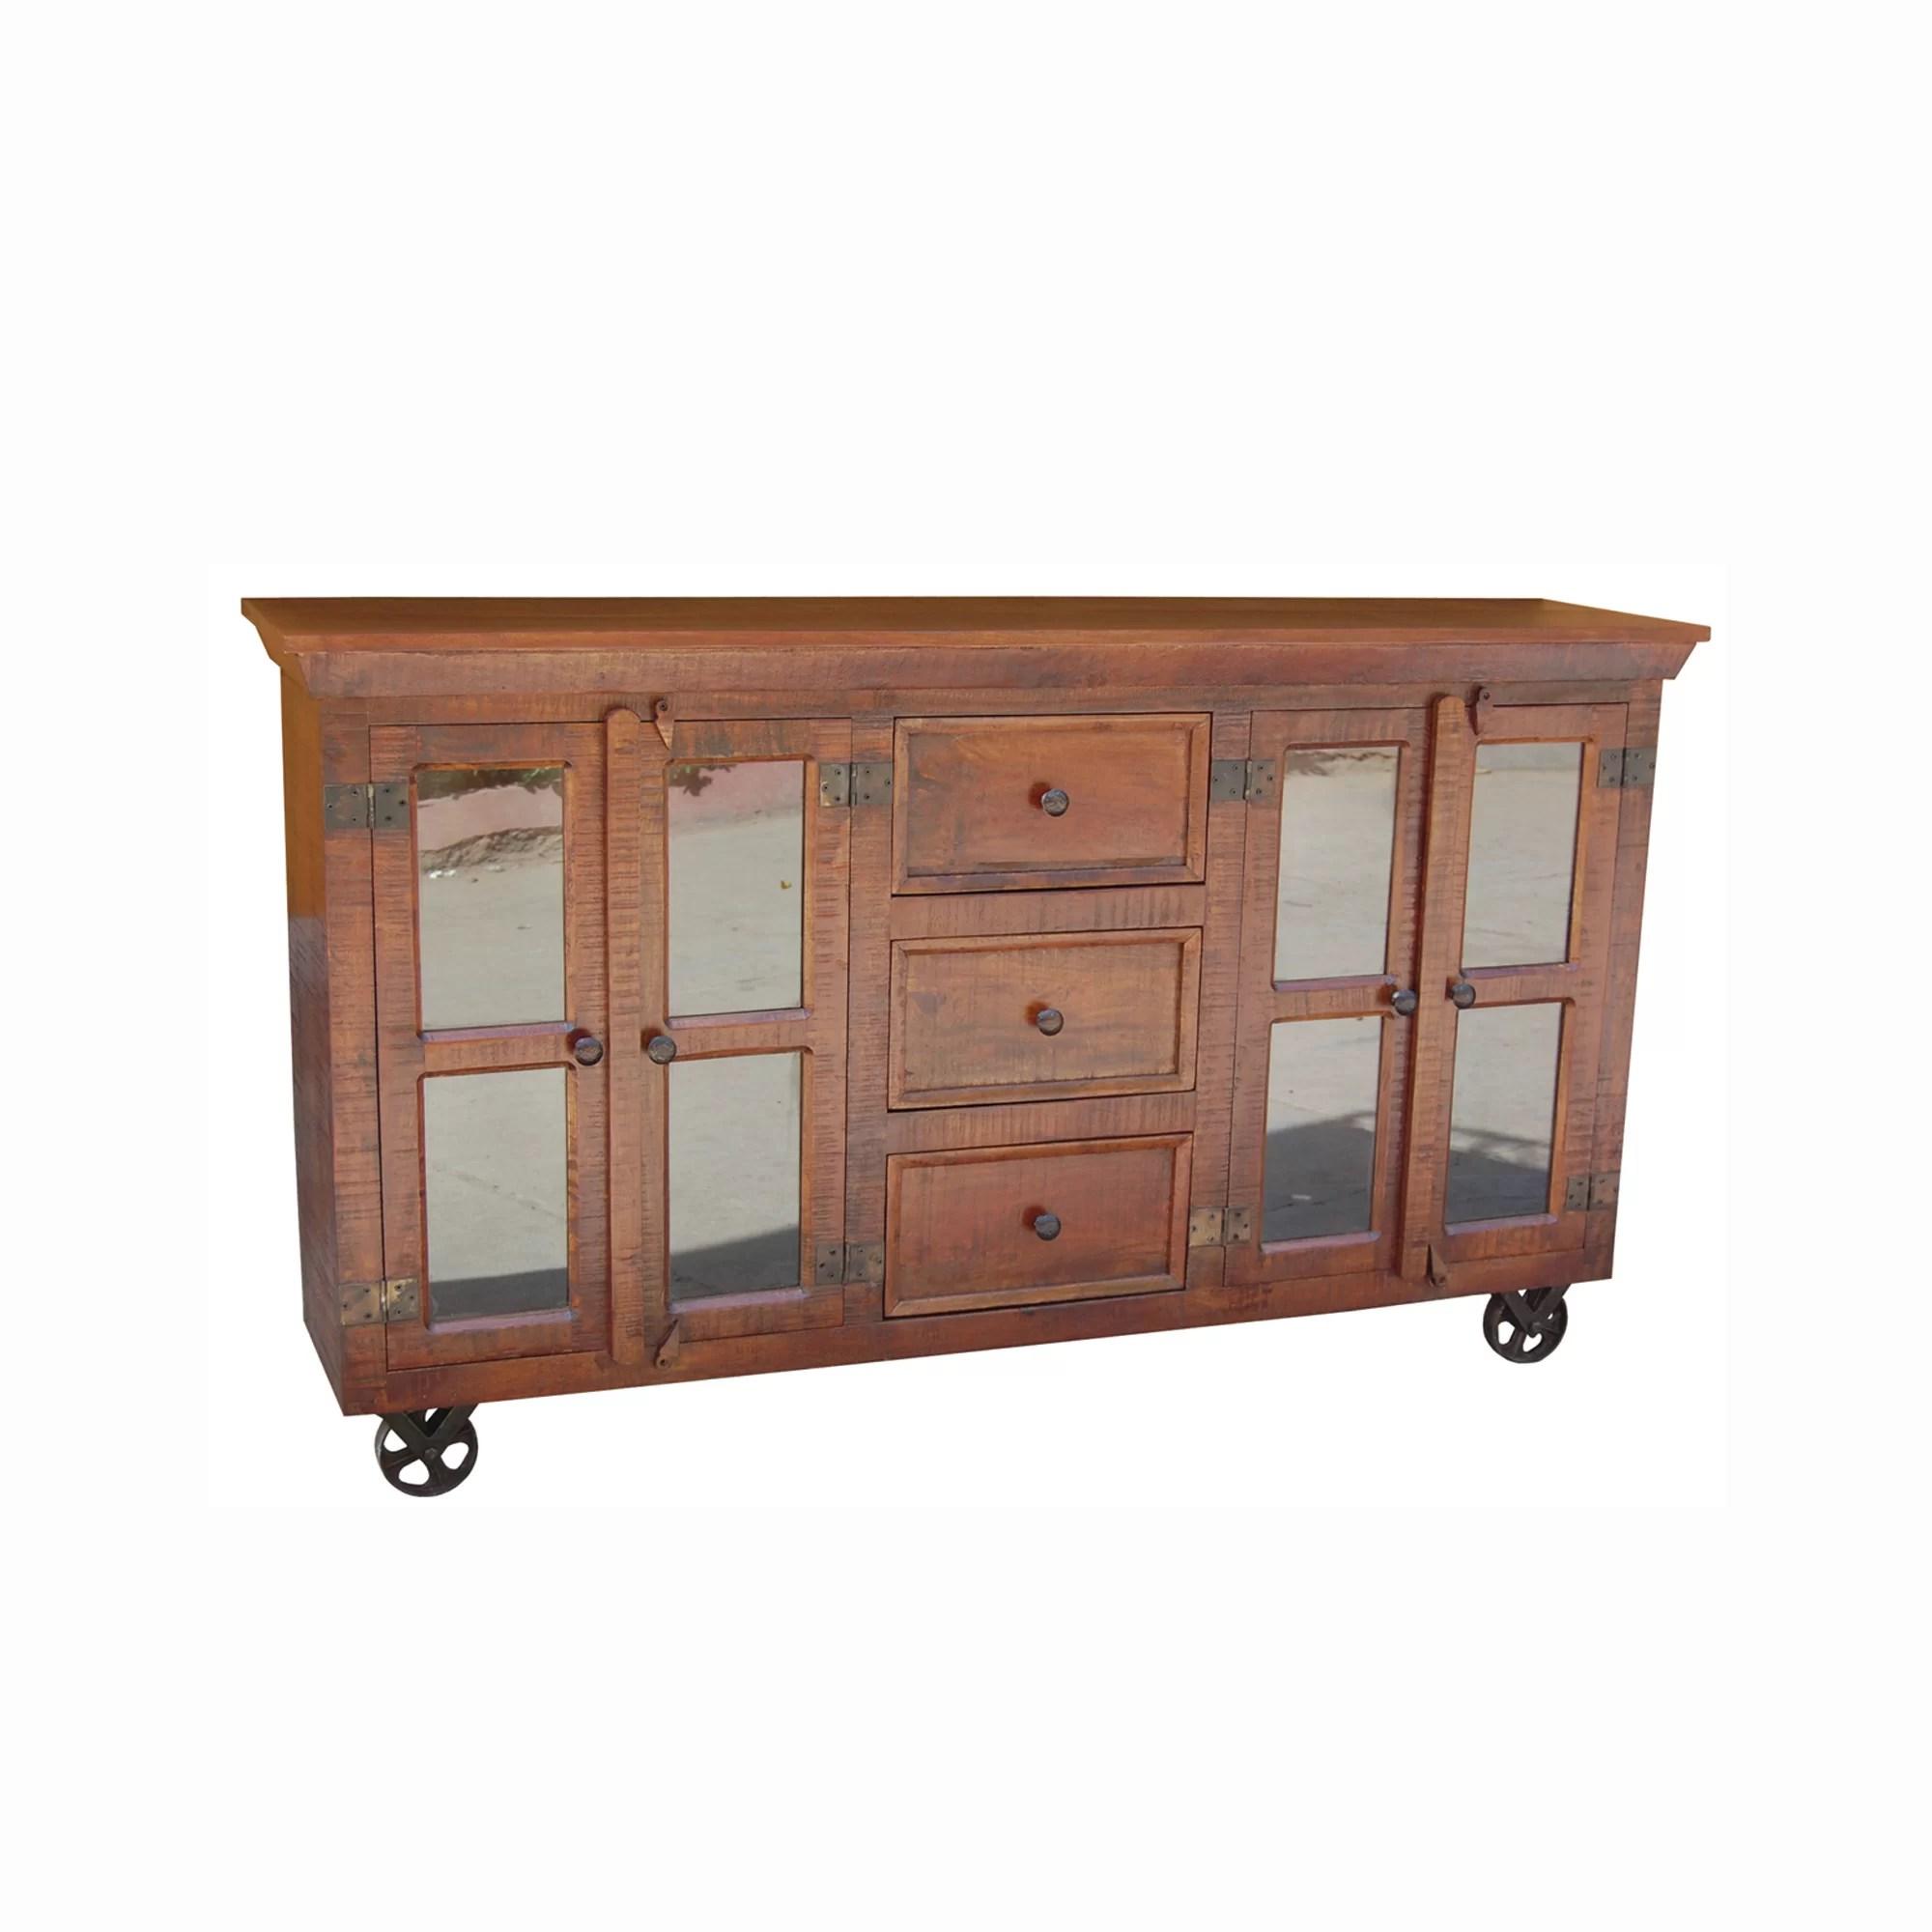 Yosemite Home Decor Storage / Display Cabinet